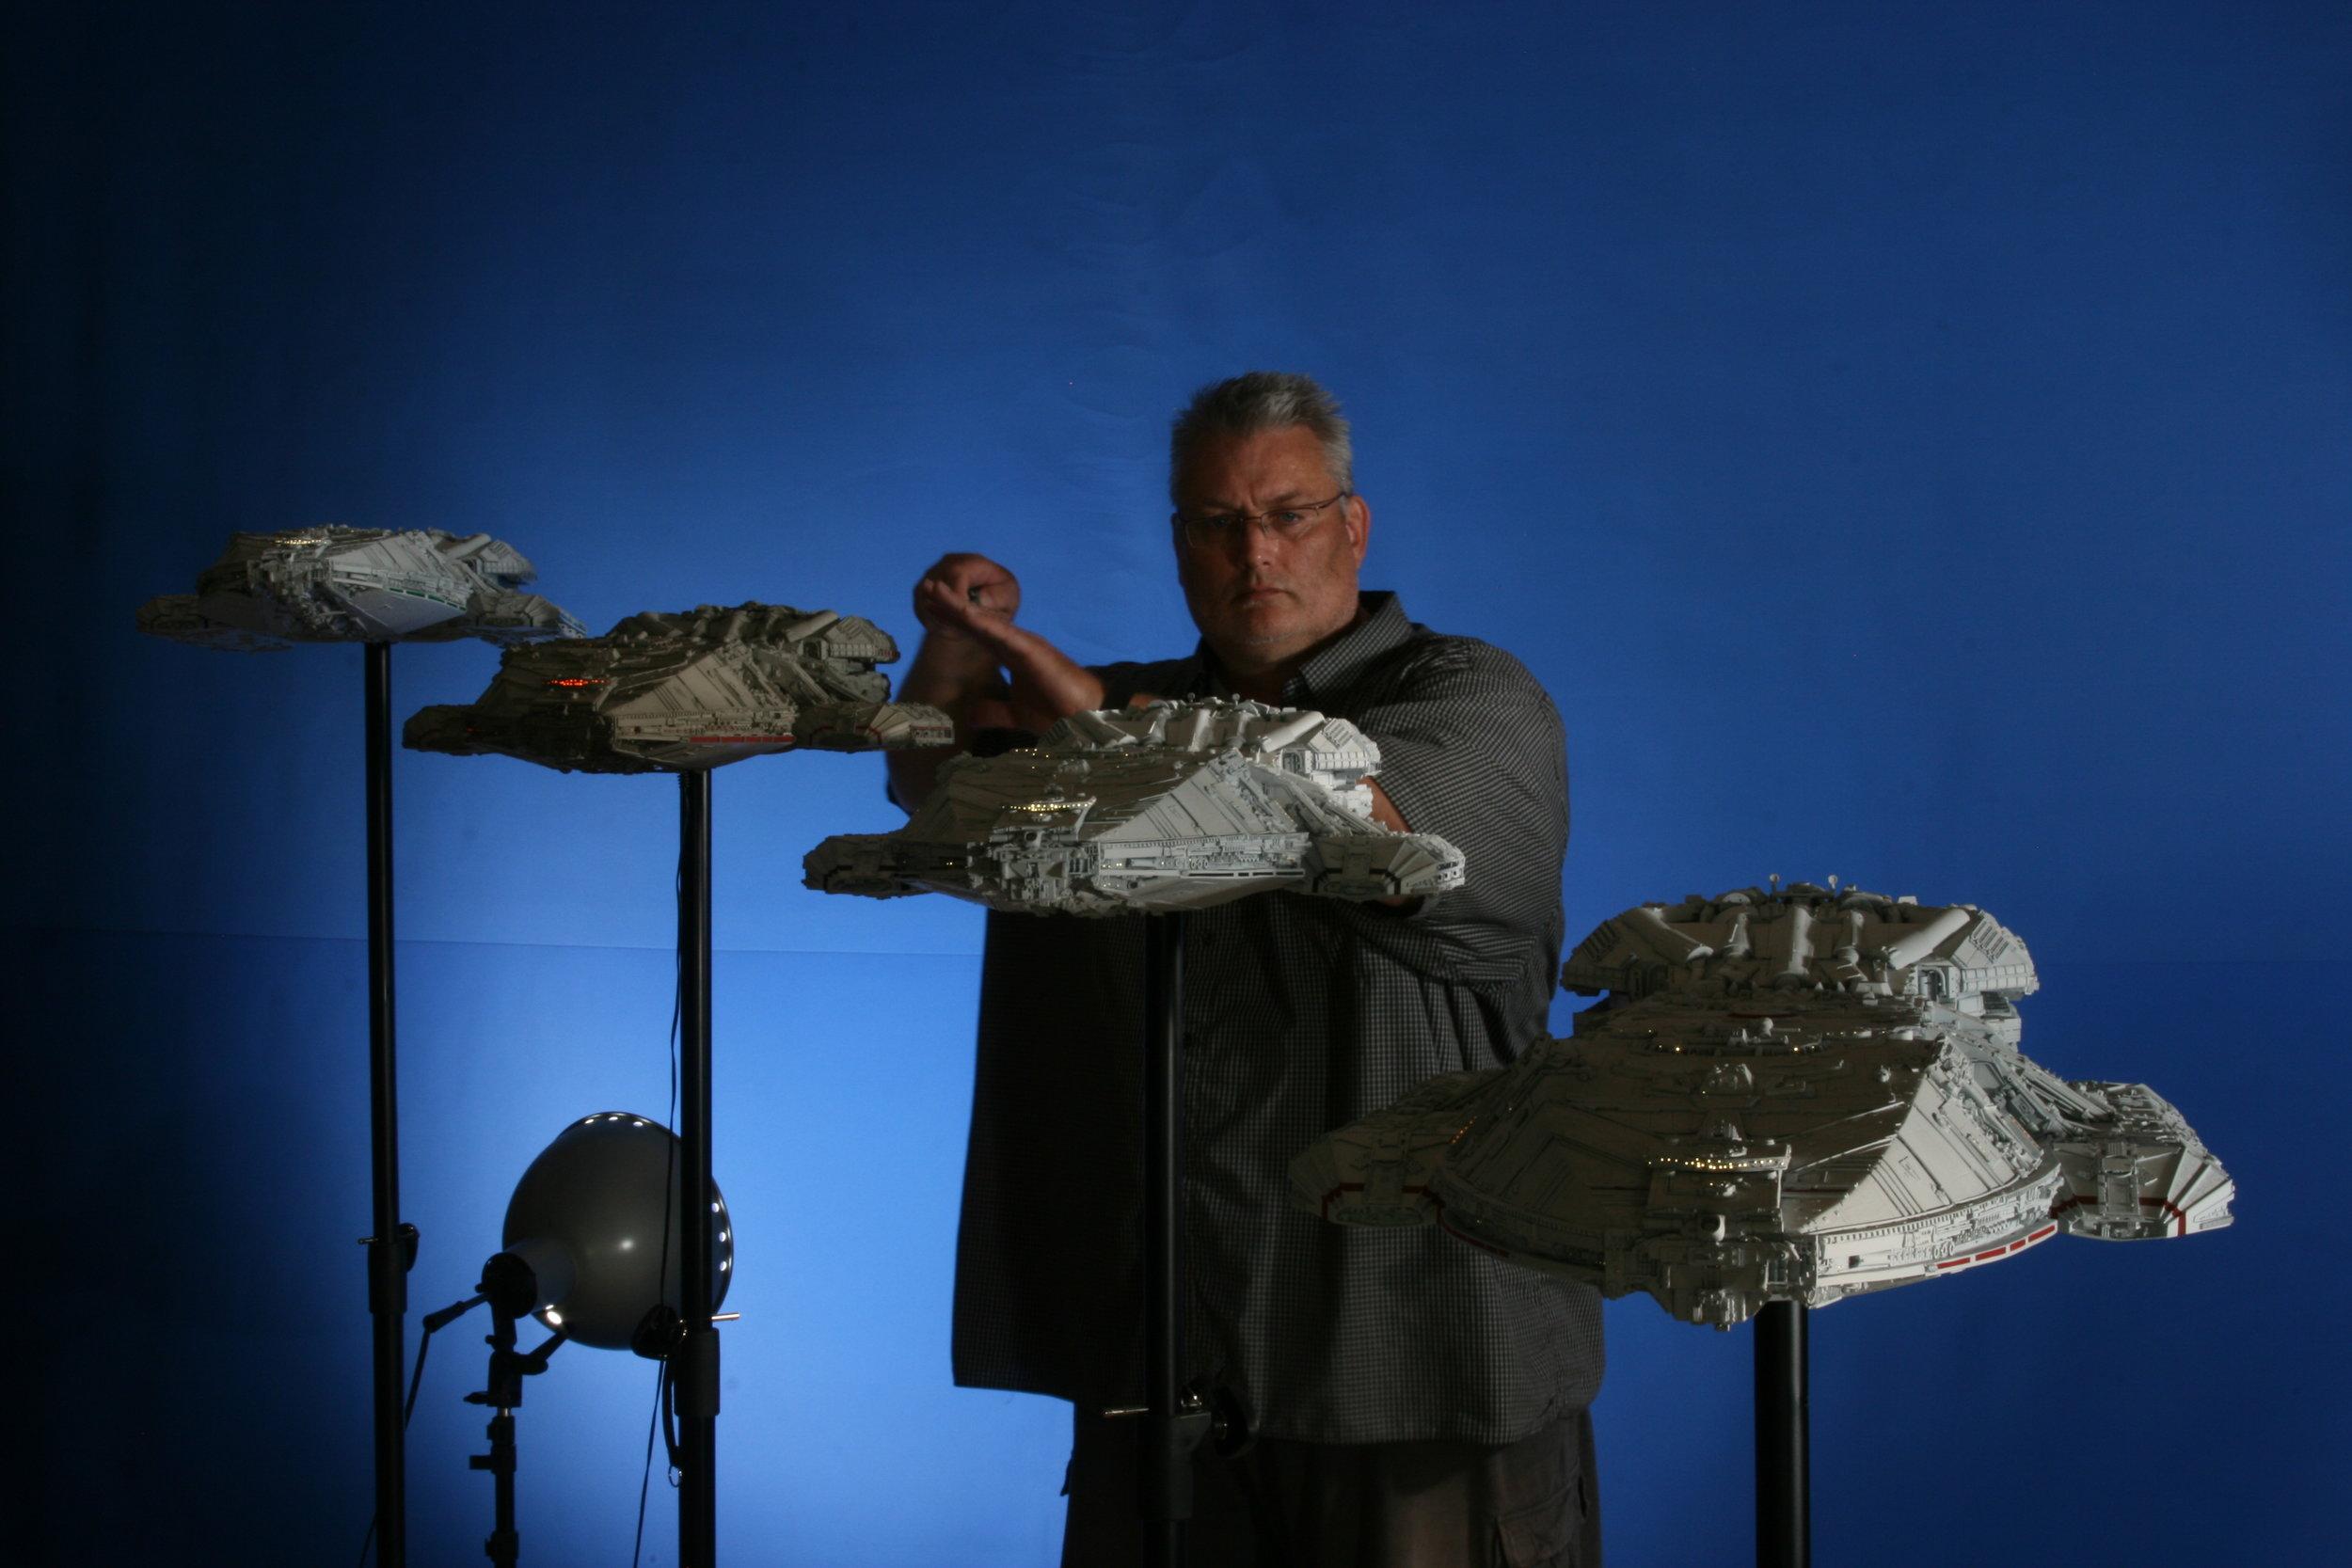 Kurt Kuhn with Battlestar task force group